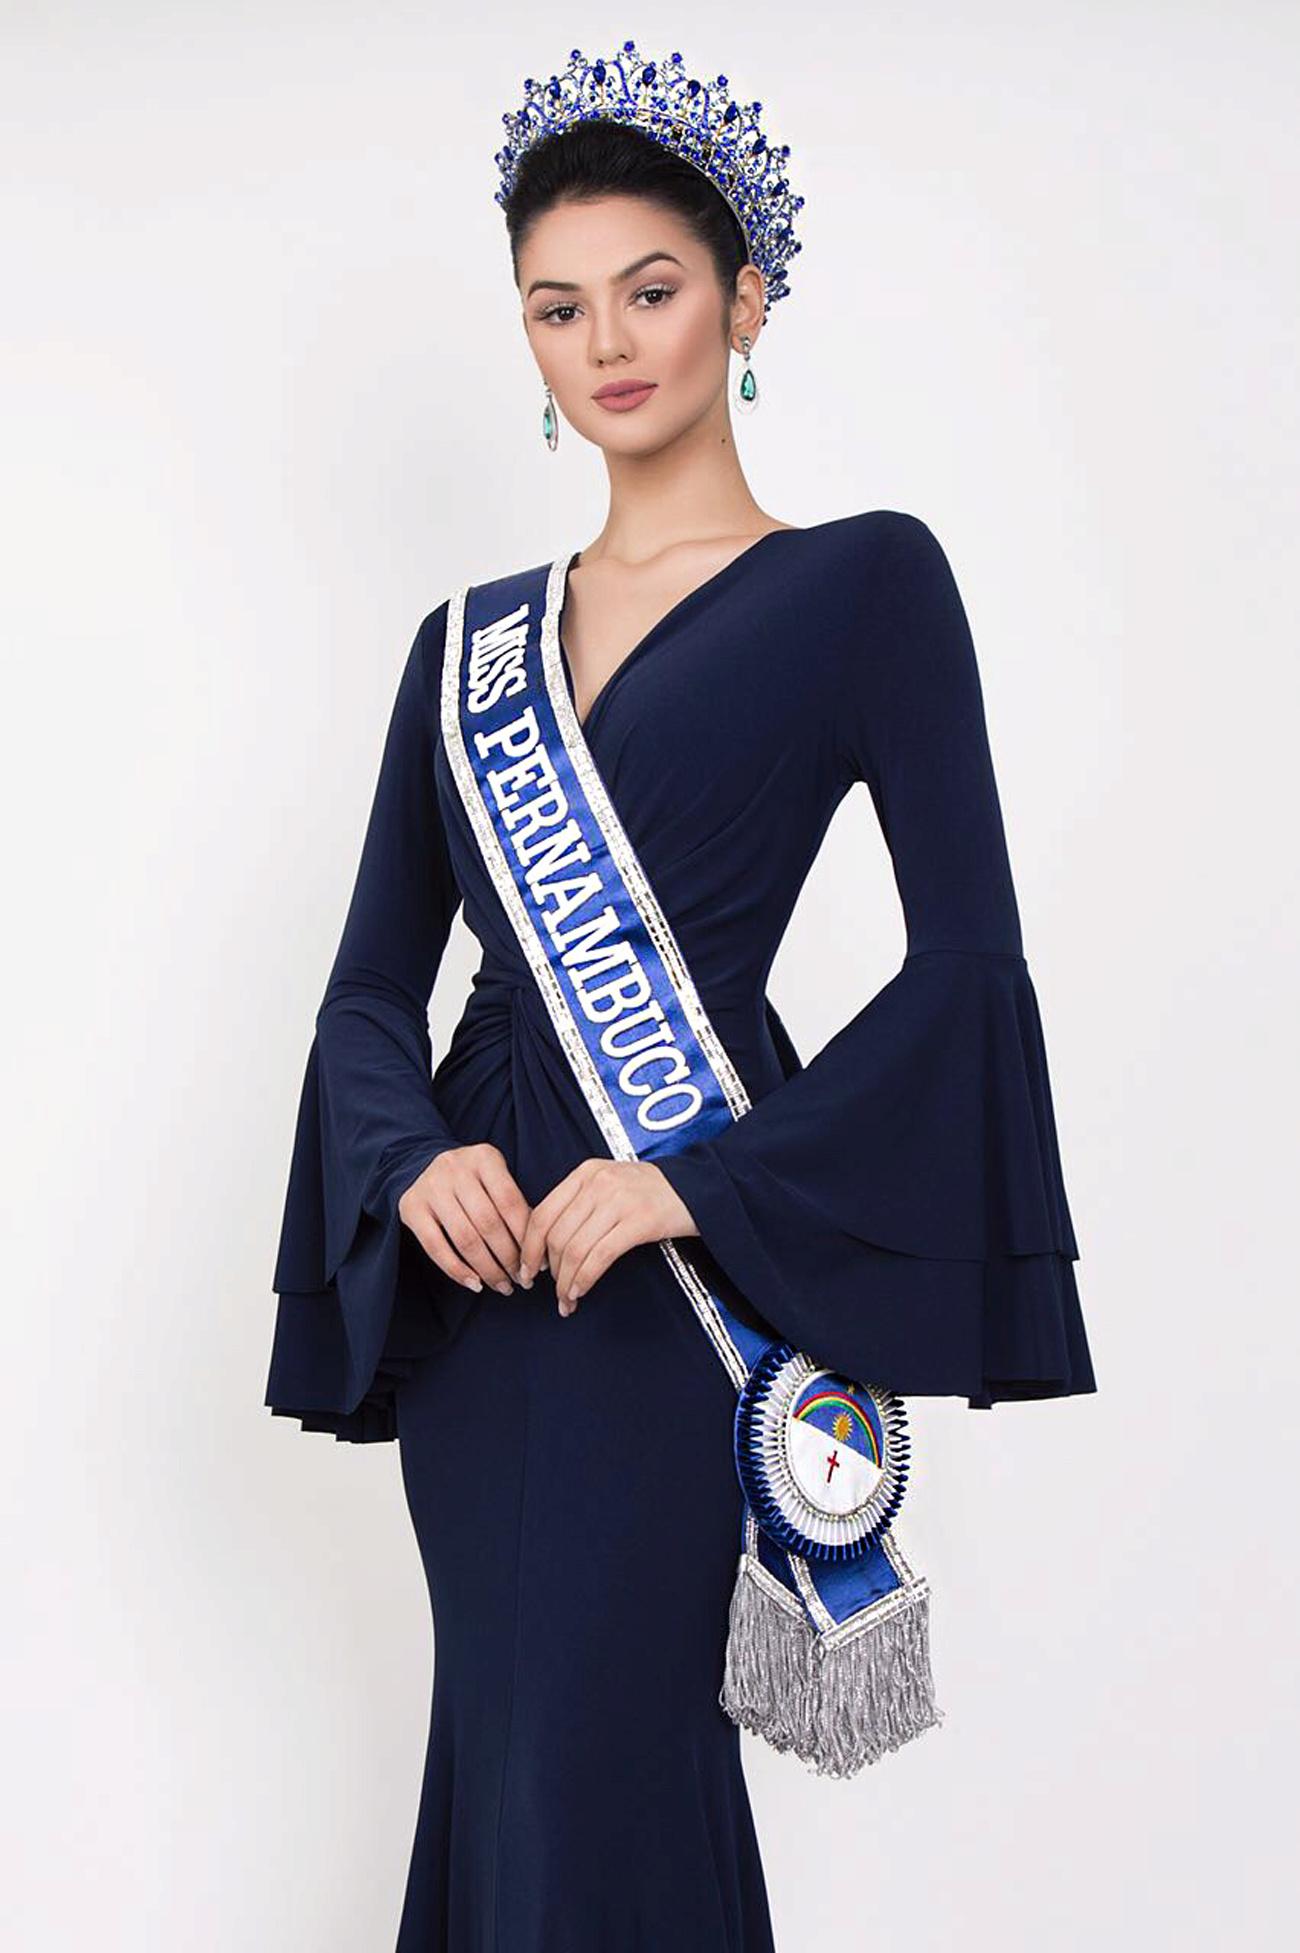 eslovenia marques, top 9 de miss grand brasil 2019. - Página 3 Image113